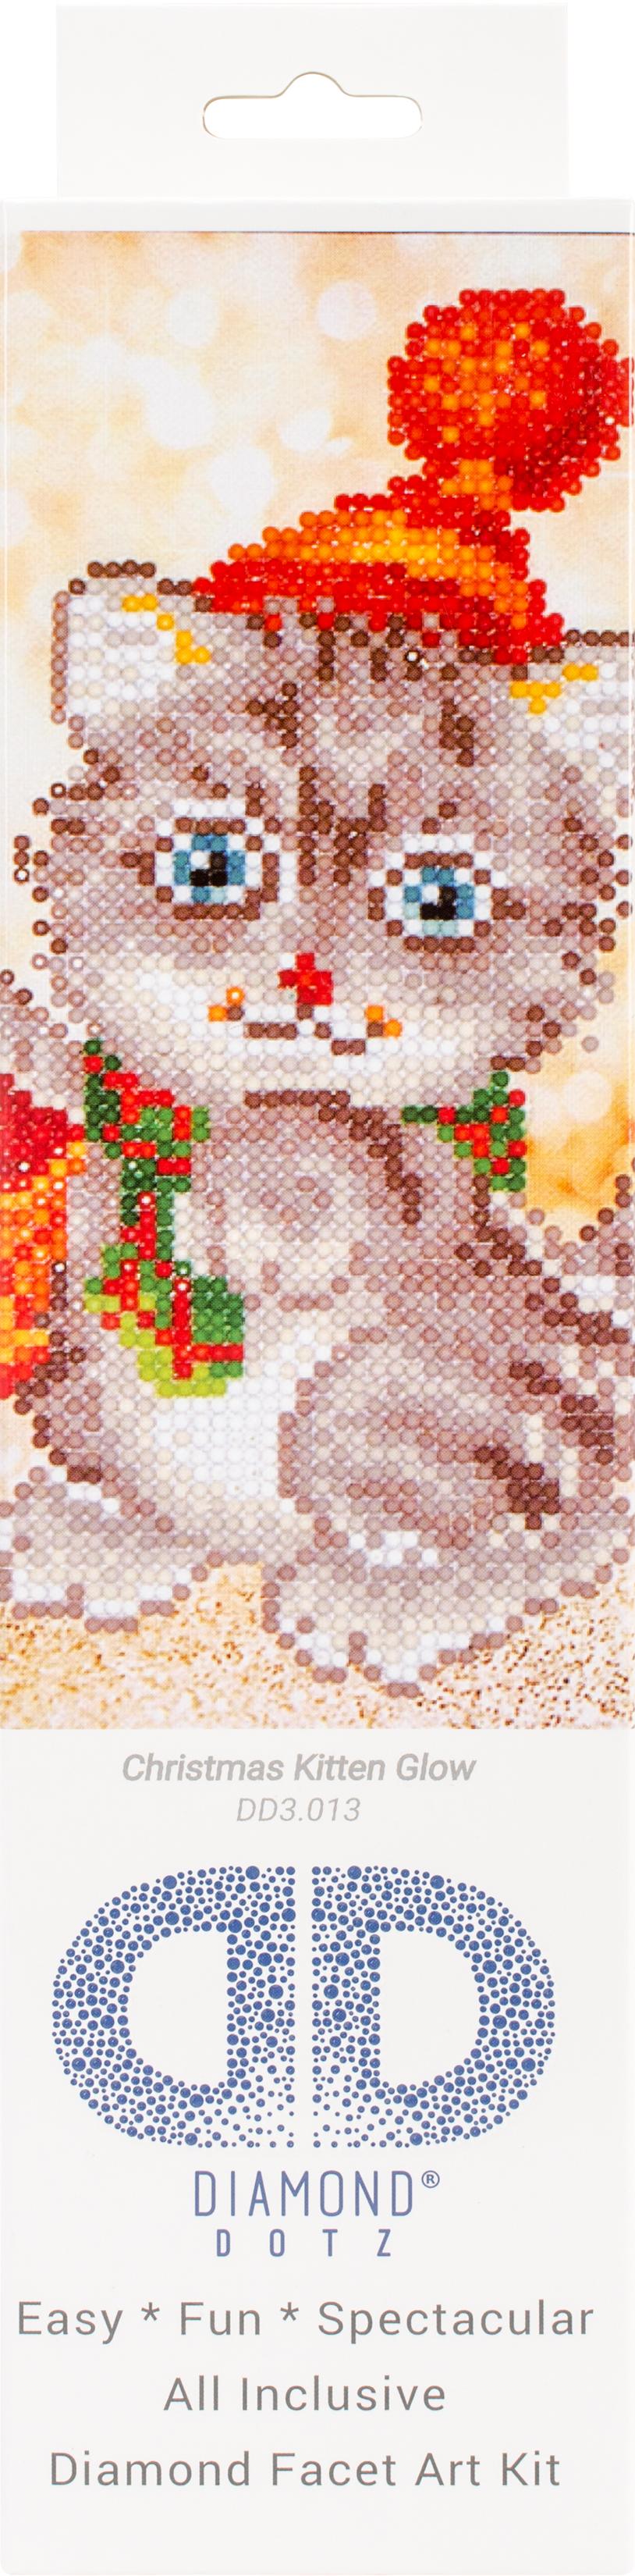 Diamond Dotz Diamond Embroidery Facet Art Kit 11X11.75-Christmas Kitten Glow